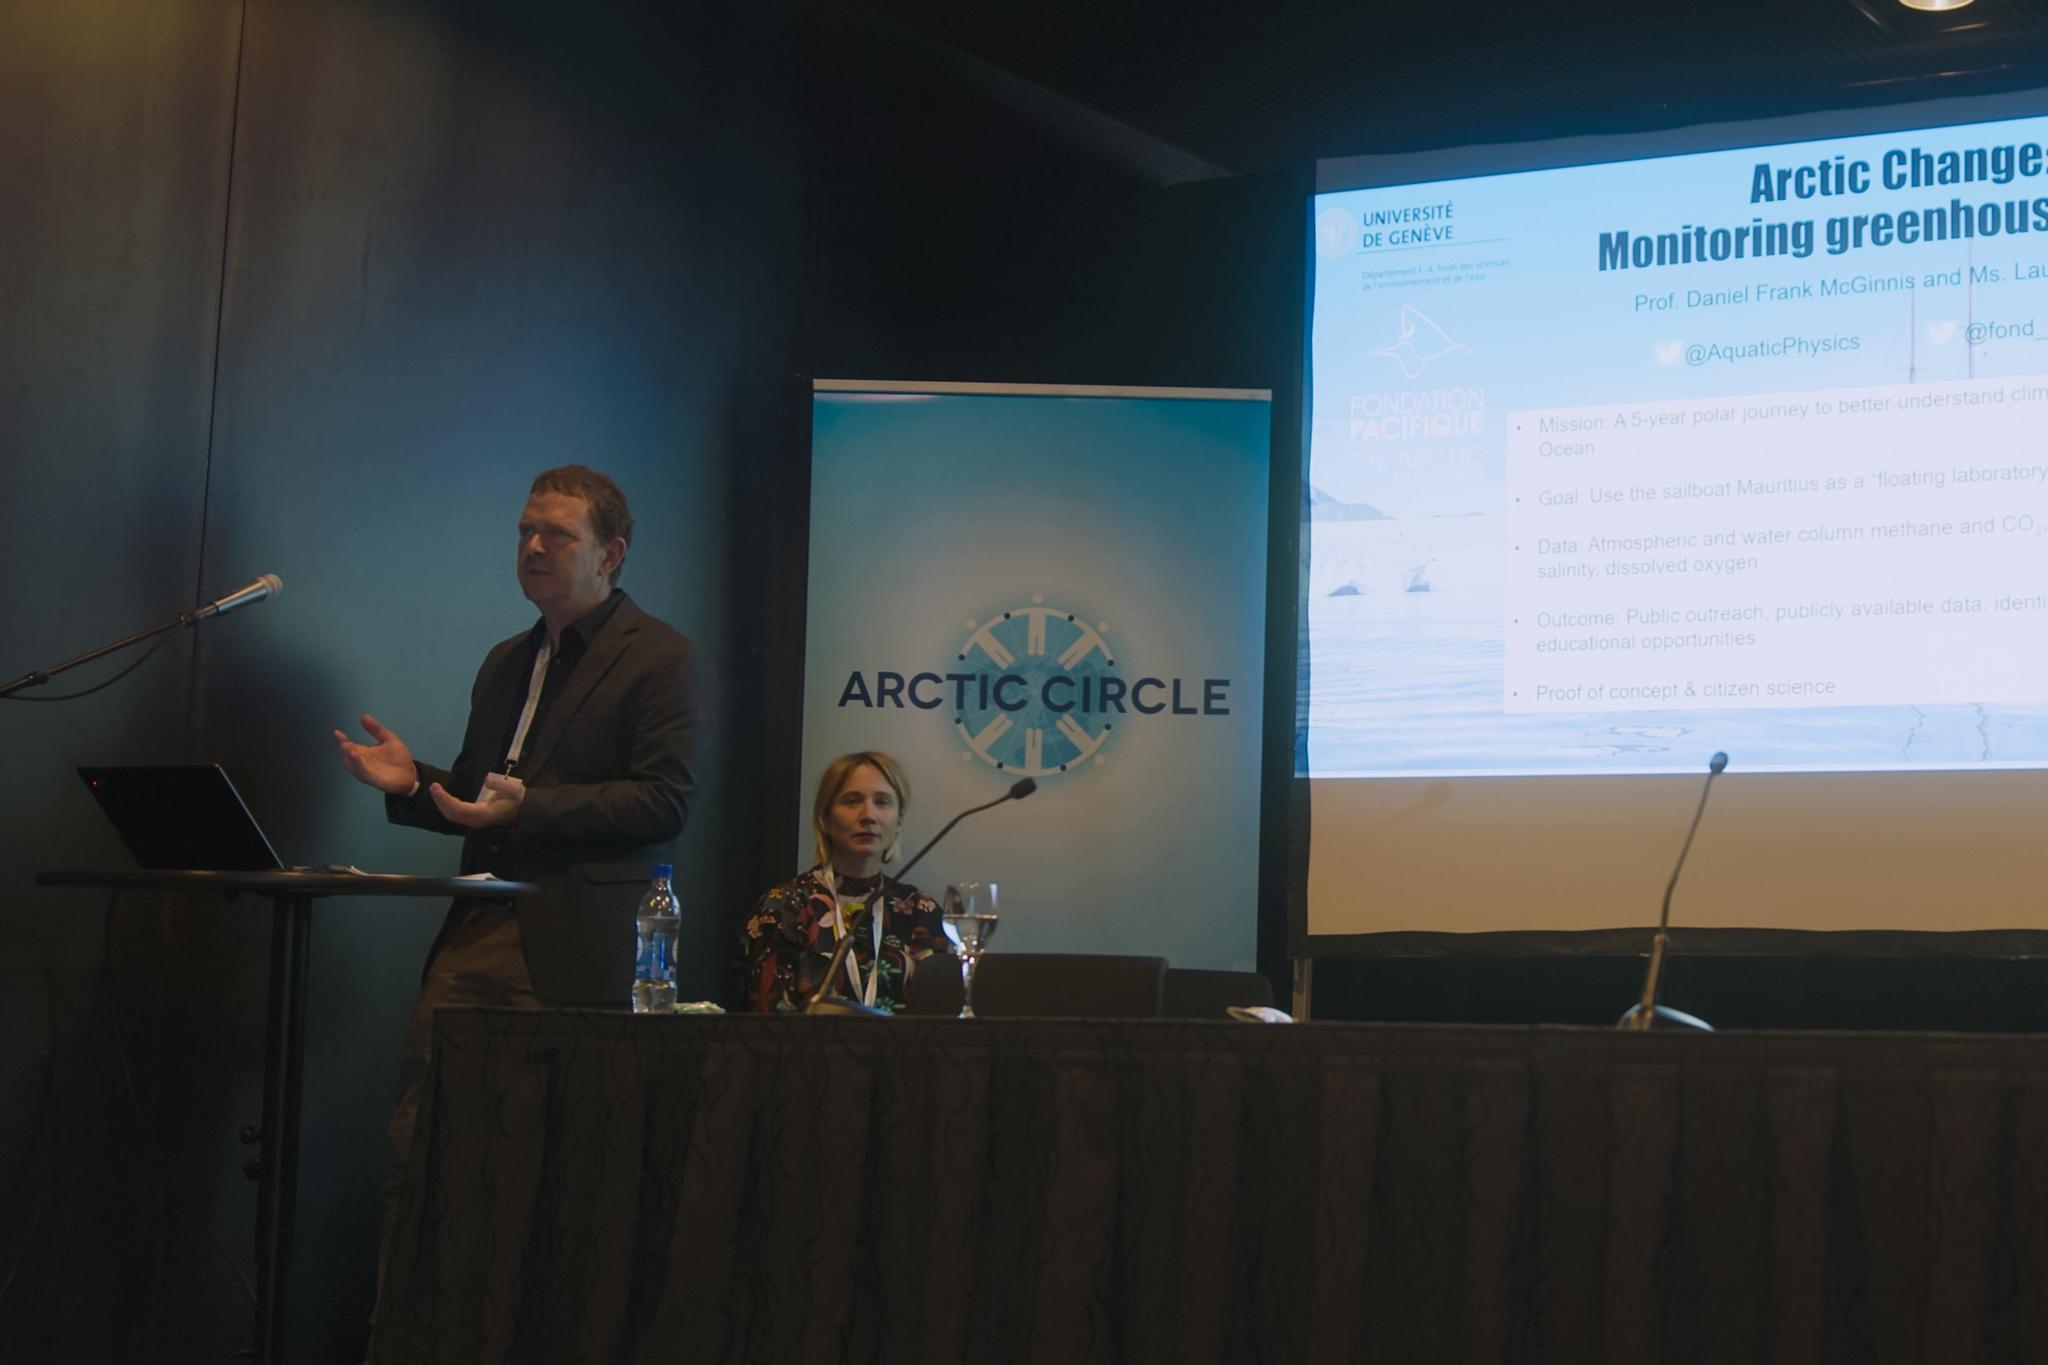 arctic_circle-4